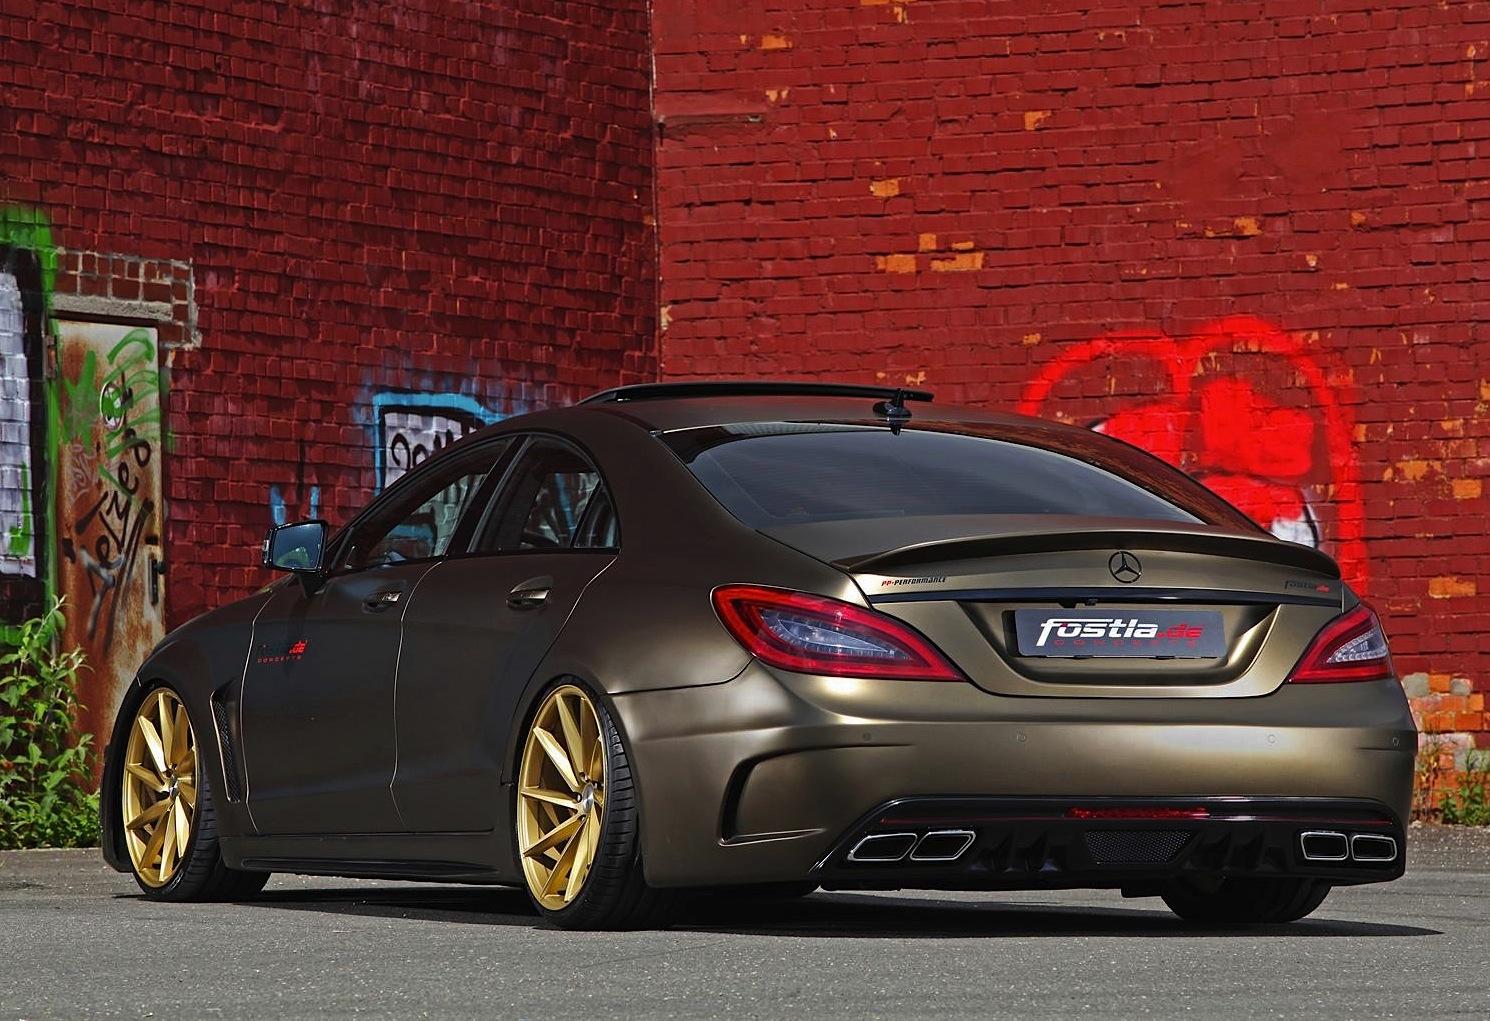 Lexus Is 350 >> Slammed Mercedes-Benz CLS 350 CDI by Fostla | PerformanceDrive